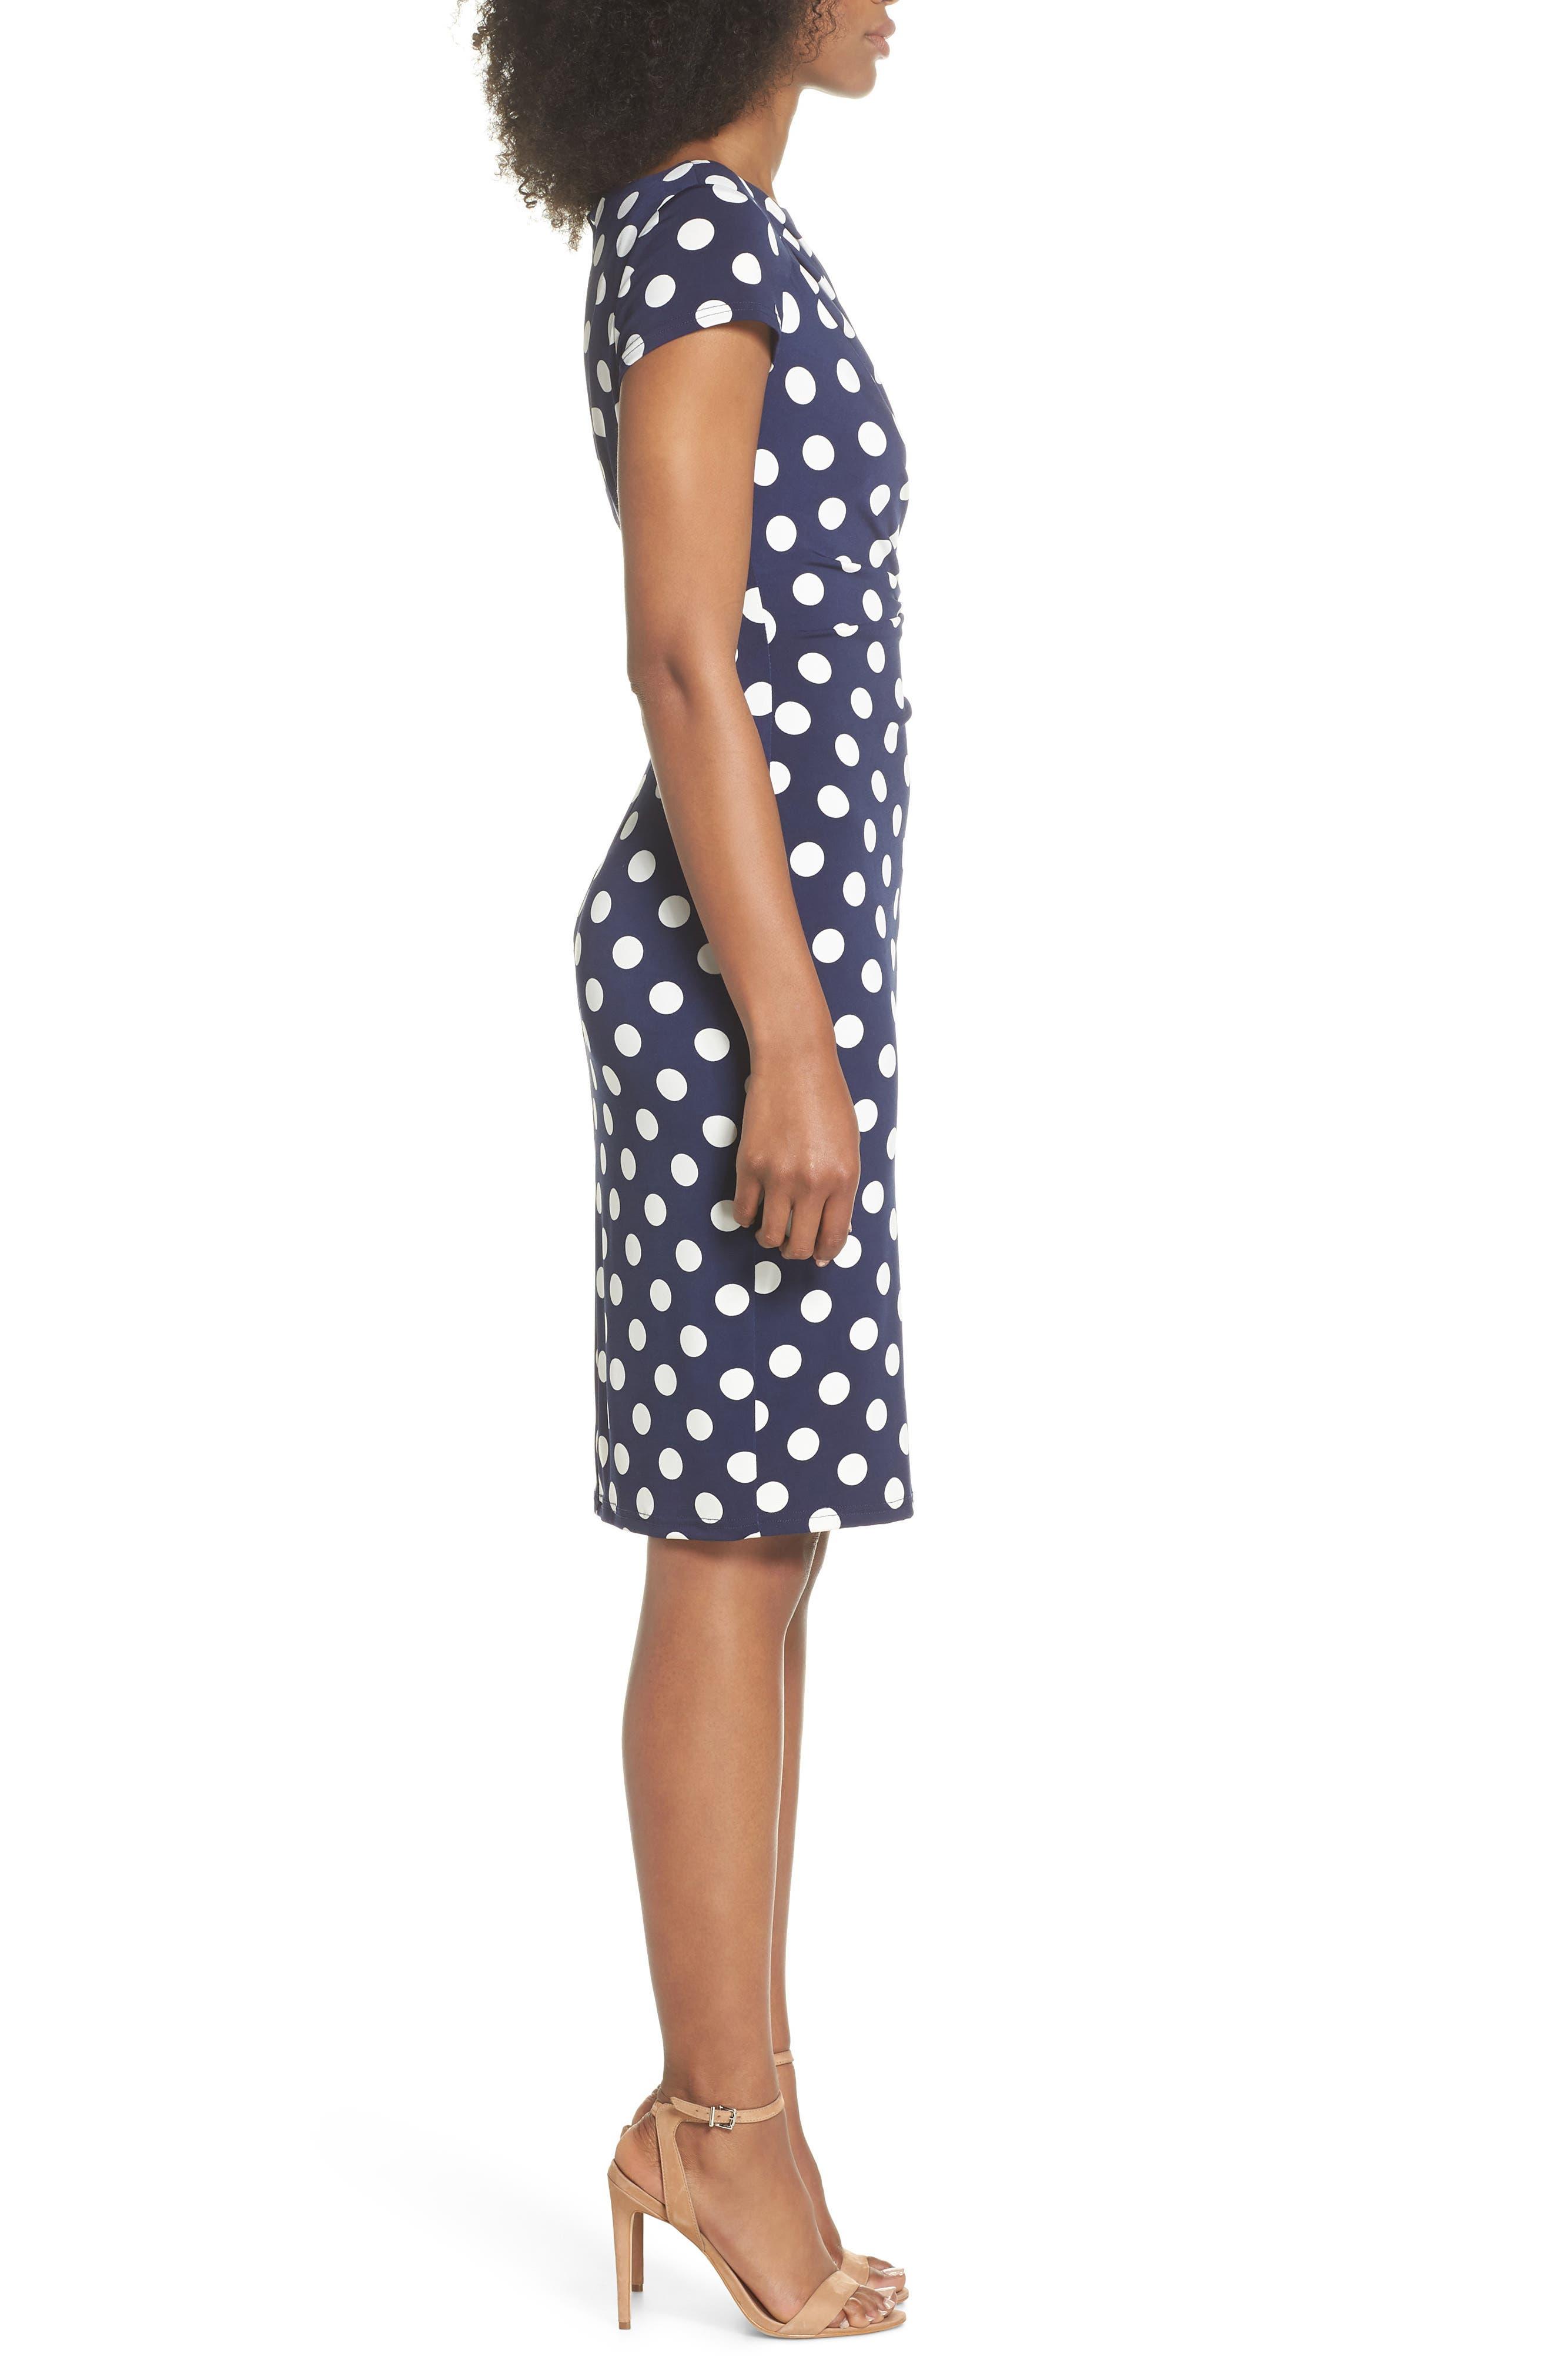 ELIZA J, Polka Dot Side Twist Sheath Dress, Alternate thumbnail 4, color, NAVY/ IVORY